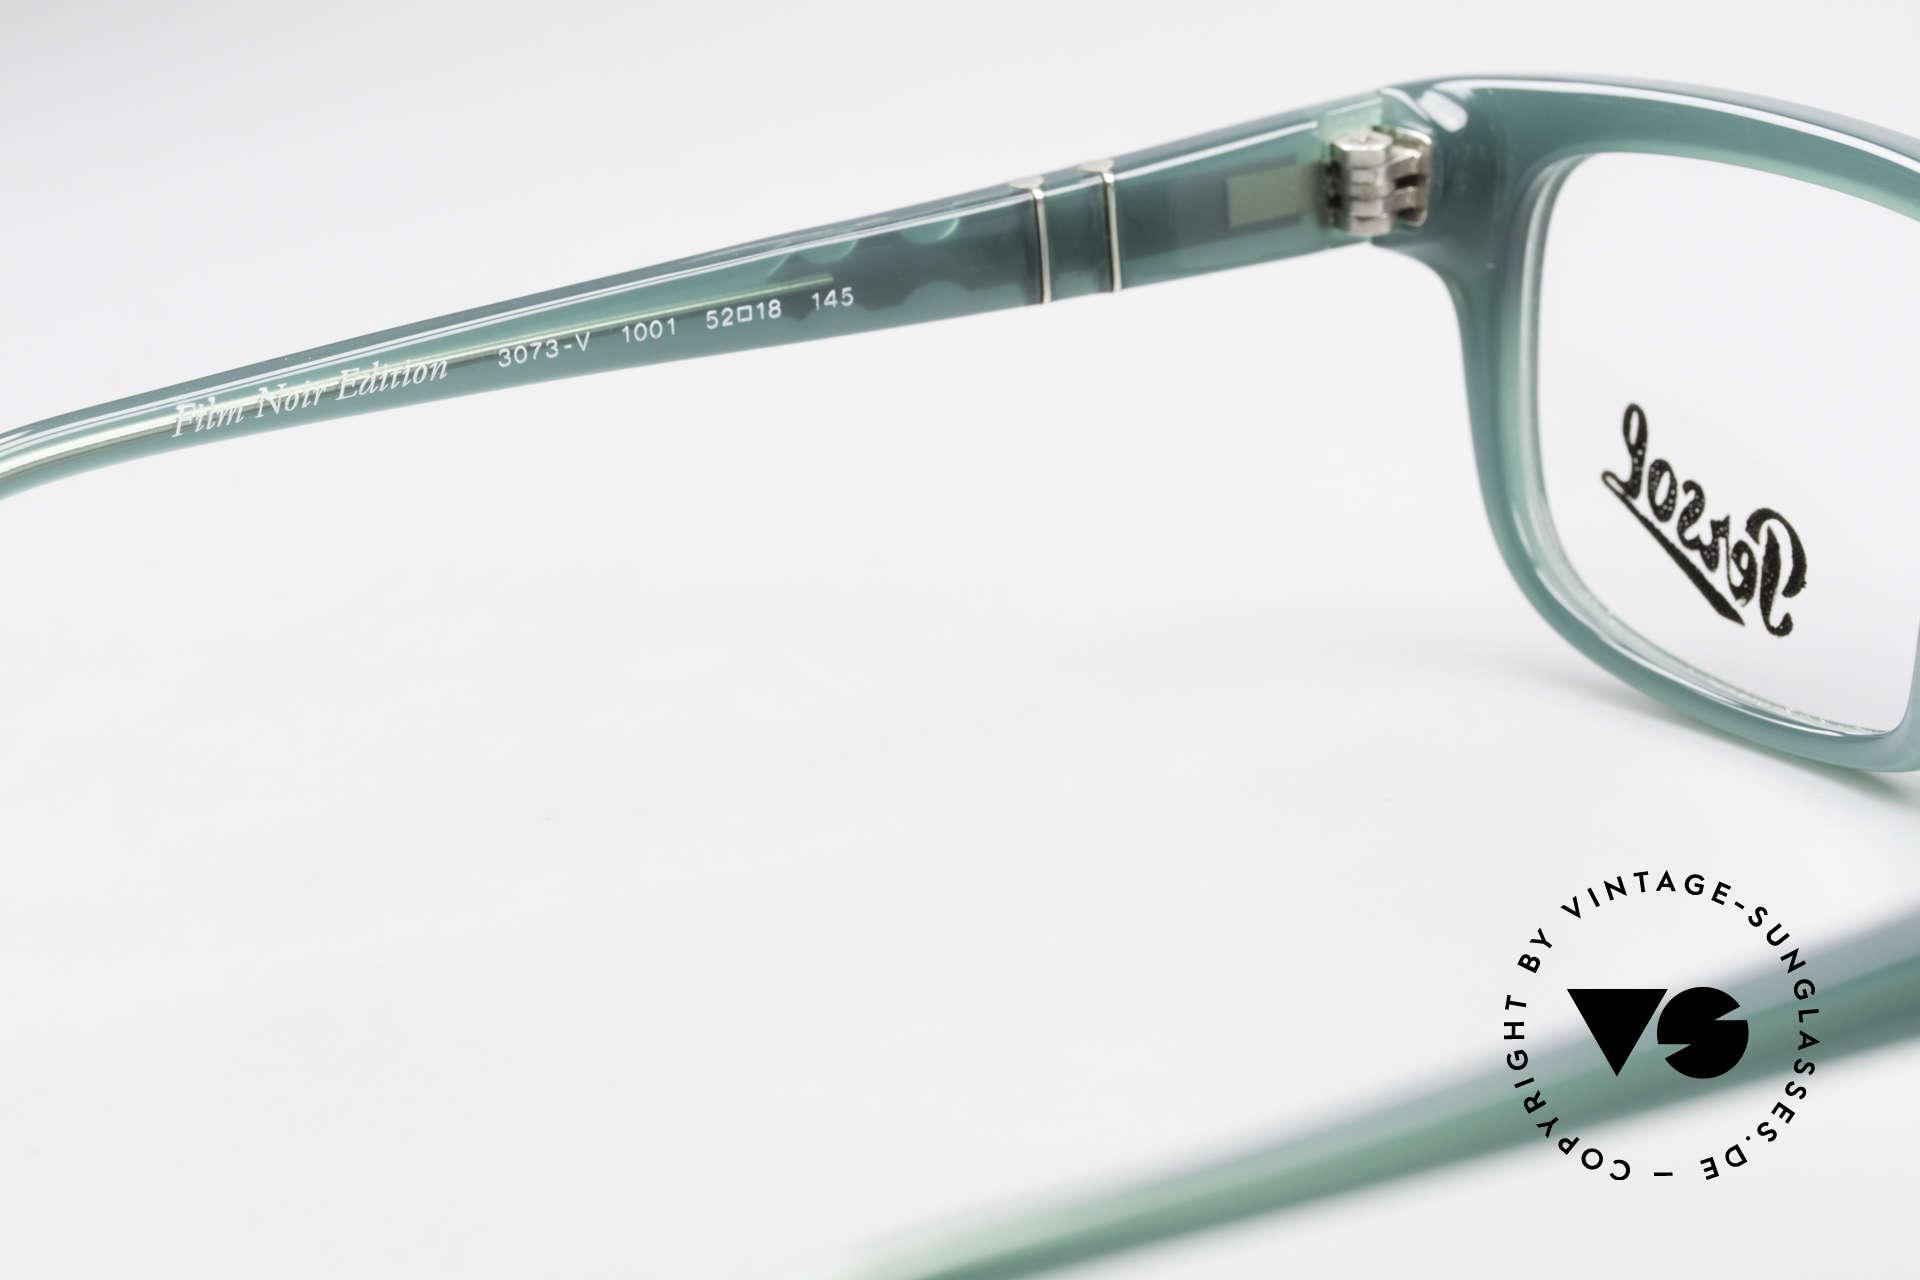 Persol 3073 Film Noir Edition Eyeglasses, original name: 3073-V, col. 1001, size 52/18, 145, Made for Men